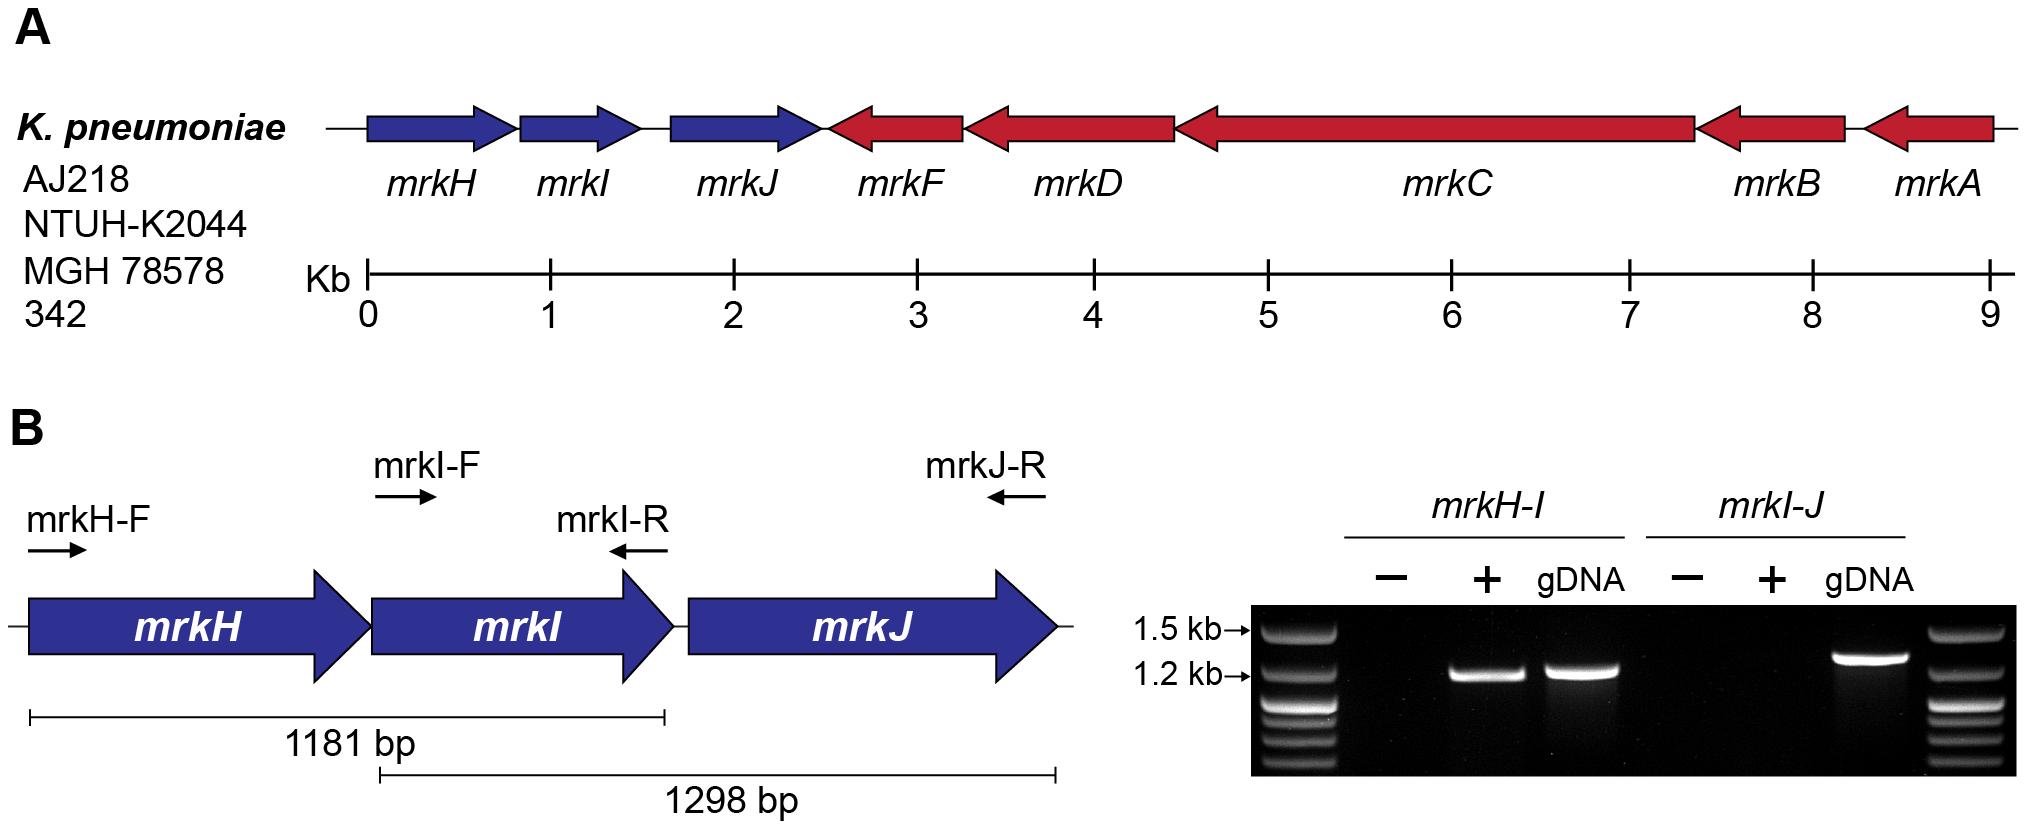 The <i>mrkABCDF</i> and <i>mrkHIJ</i> loci in <i>K. pneumoniae</i> AJ218.